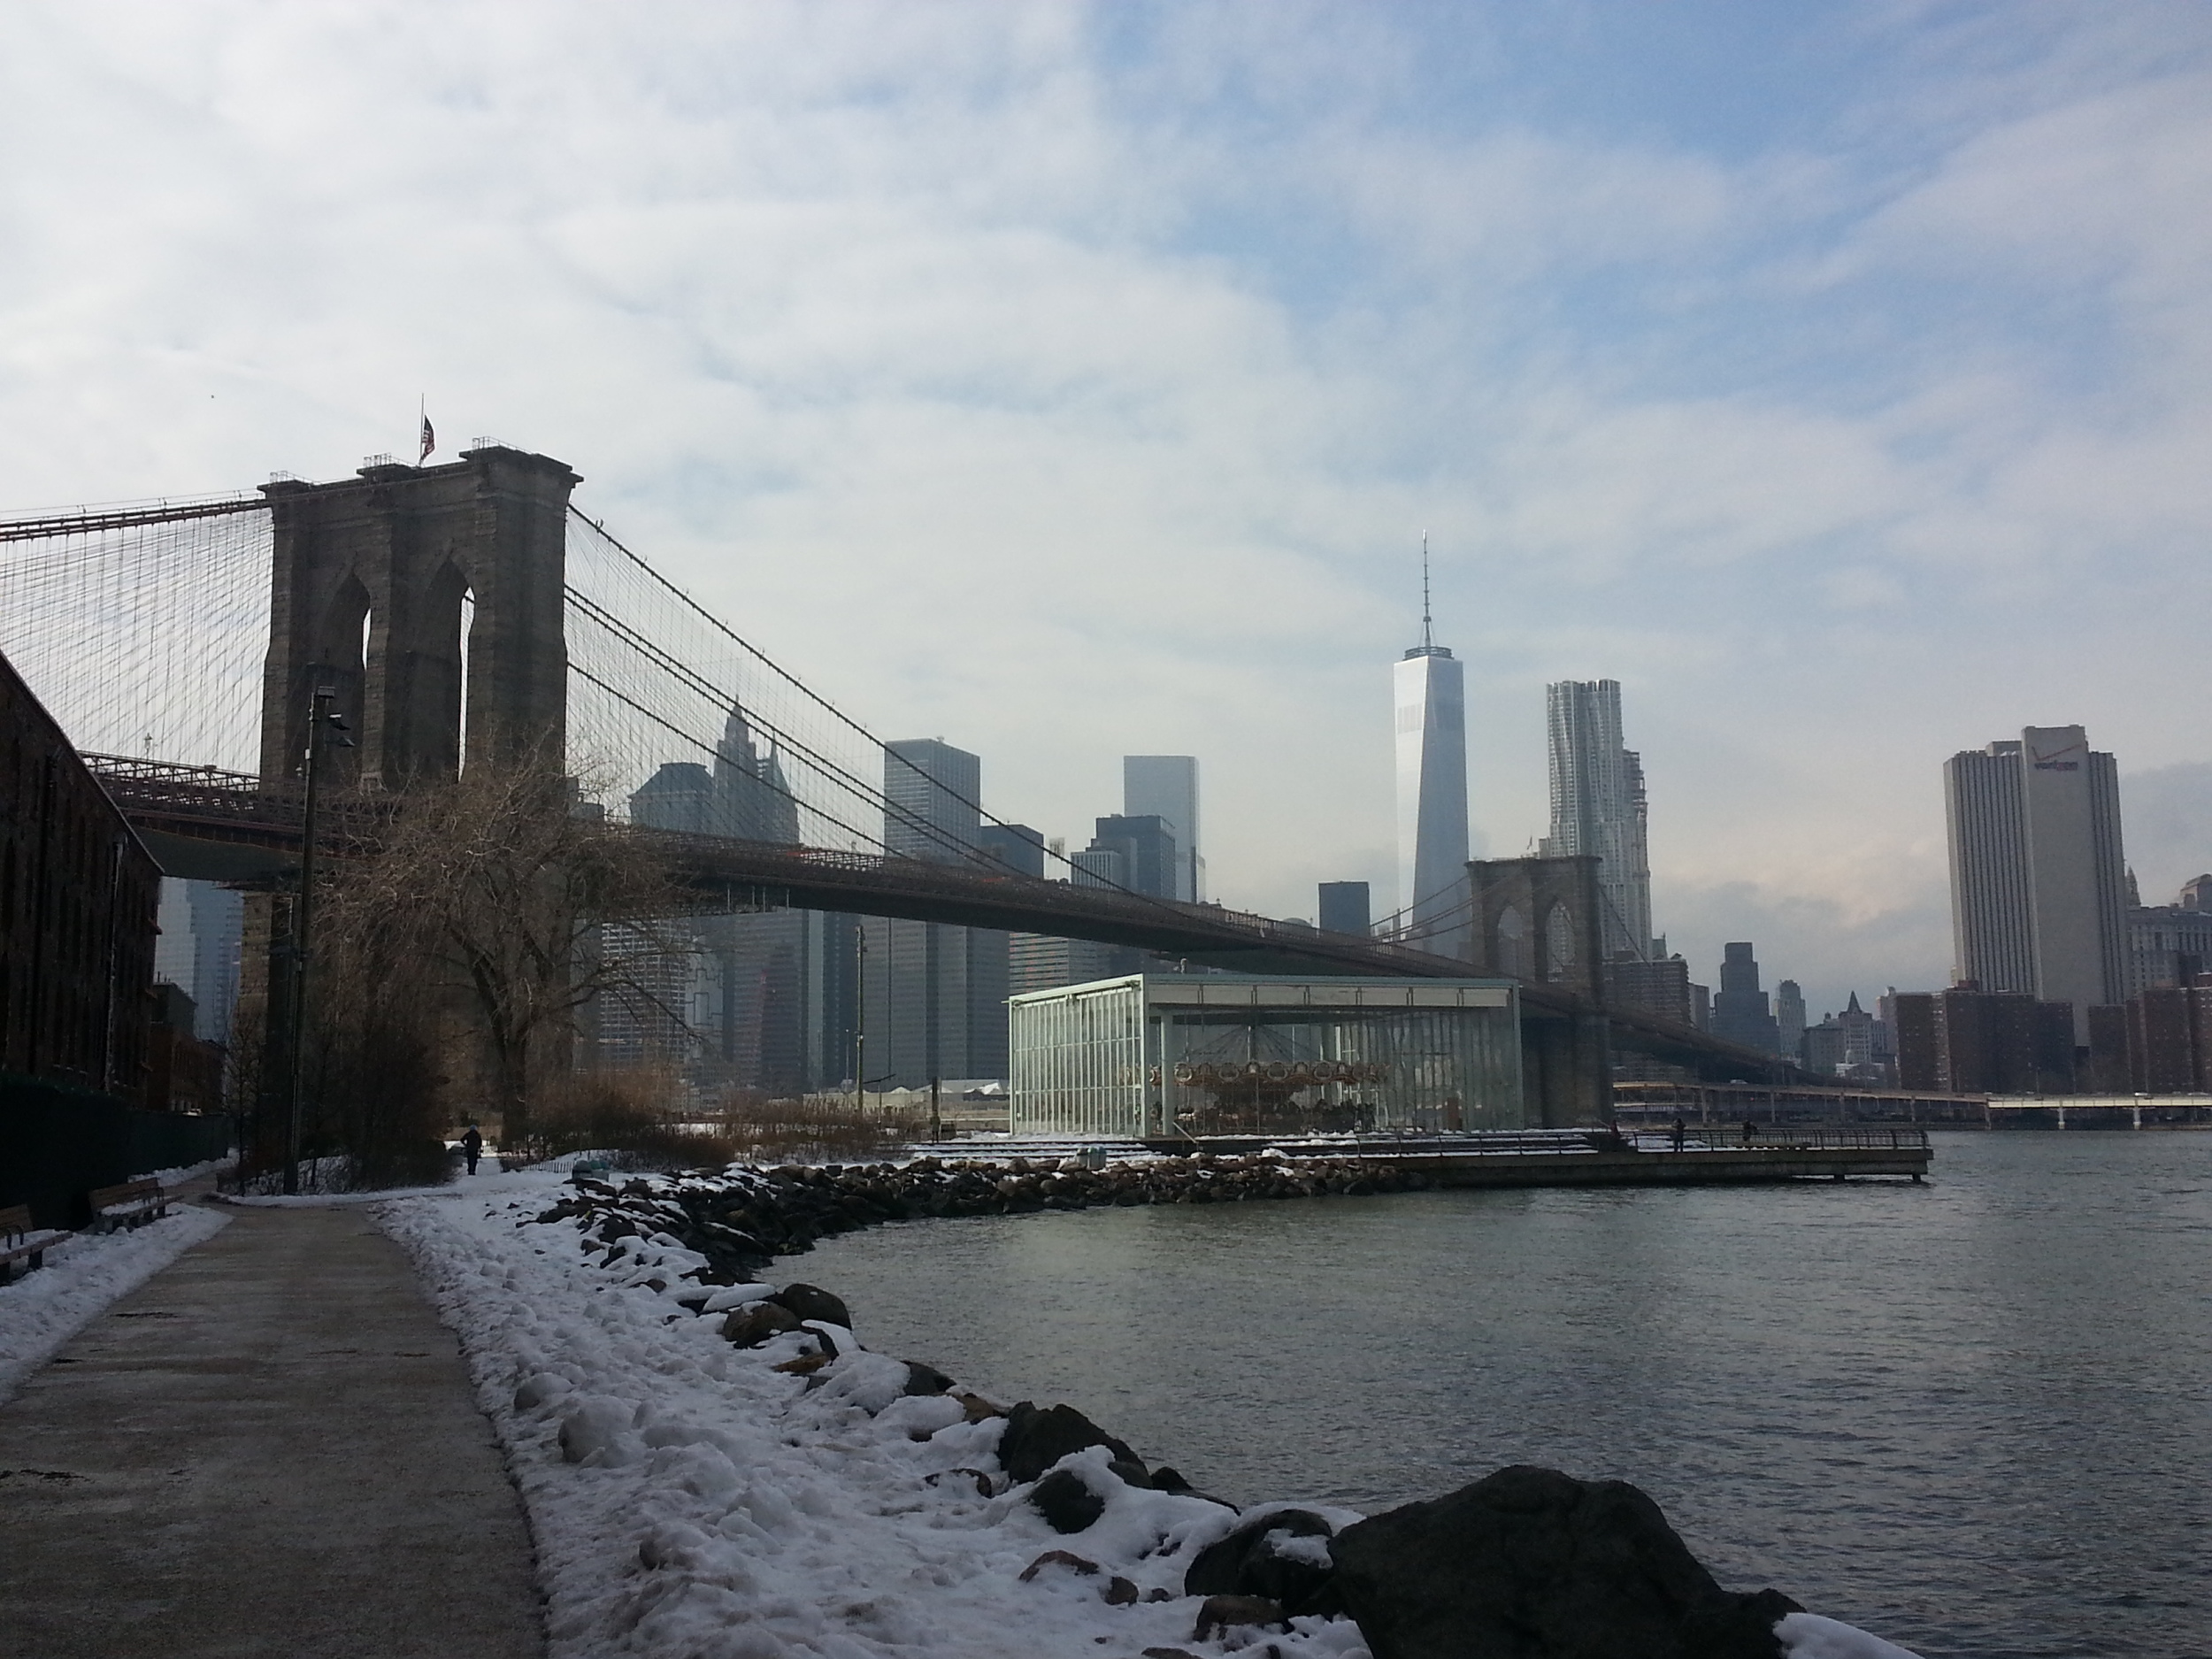 The Brooklyn Bridge, Park, and Jane's Carousel